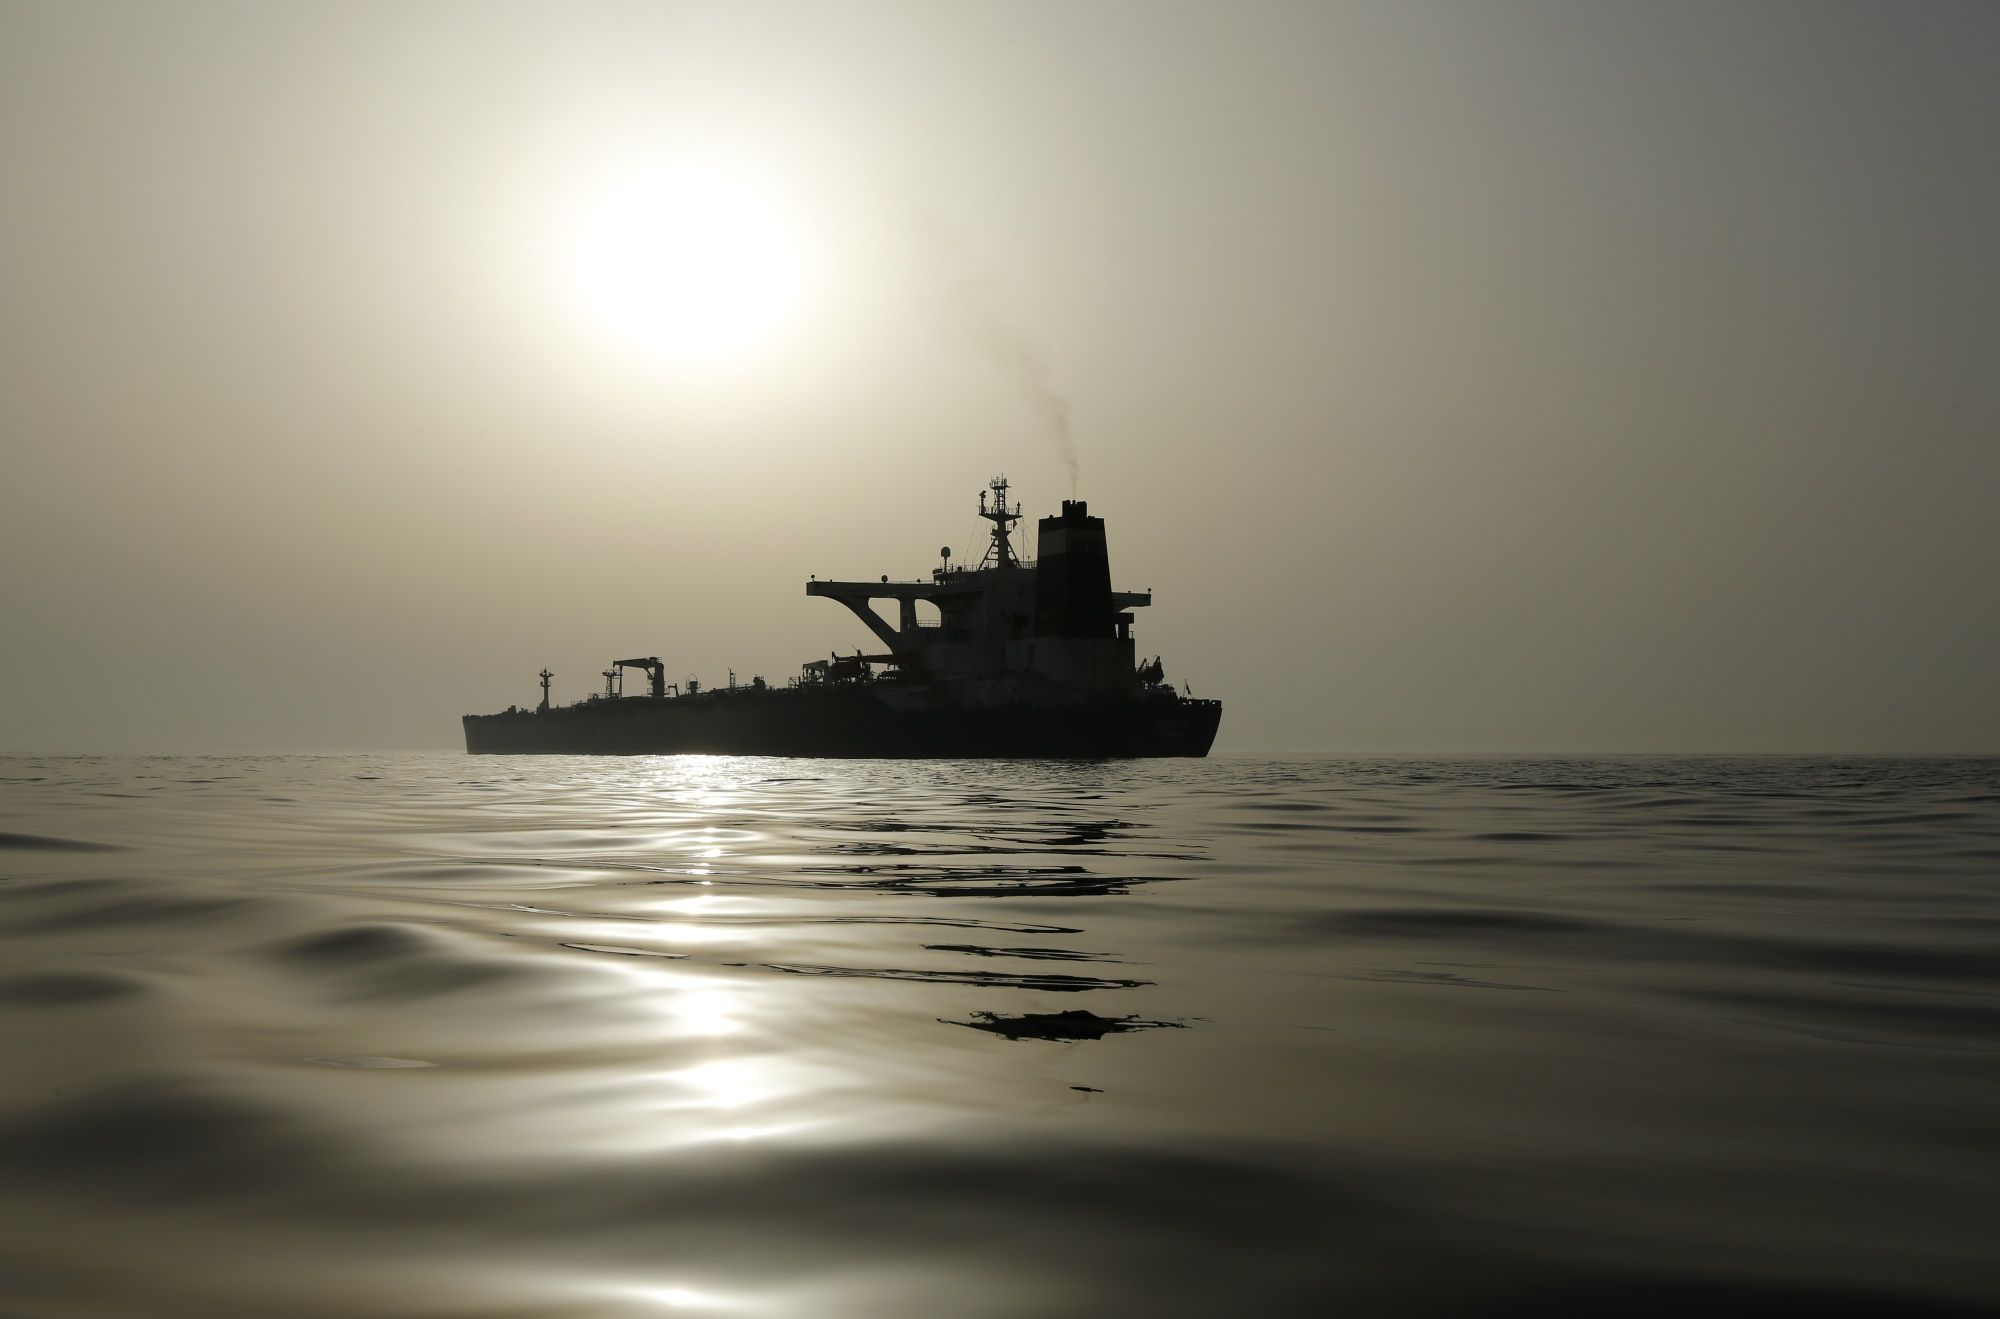 Oil Resumes Decline as Trade War Overshadows Iran Tanker Seizure